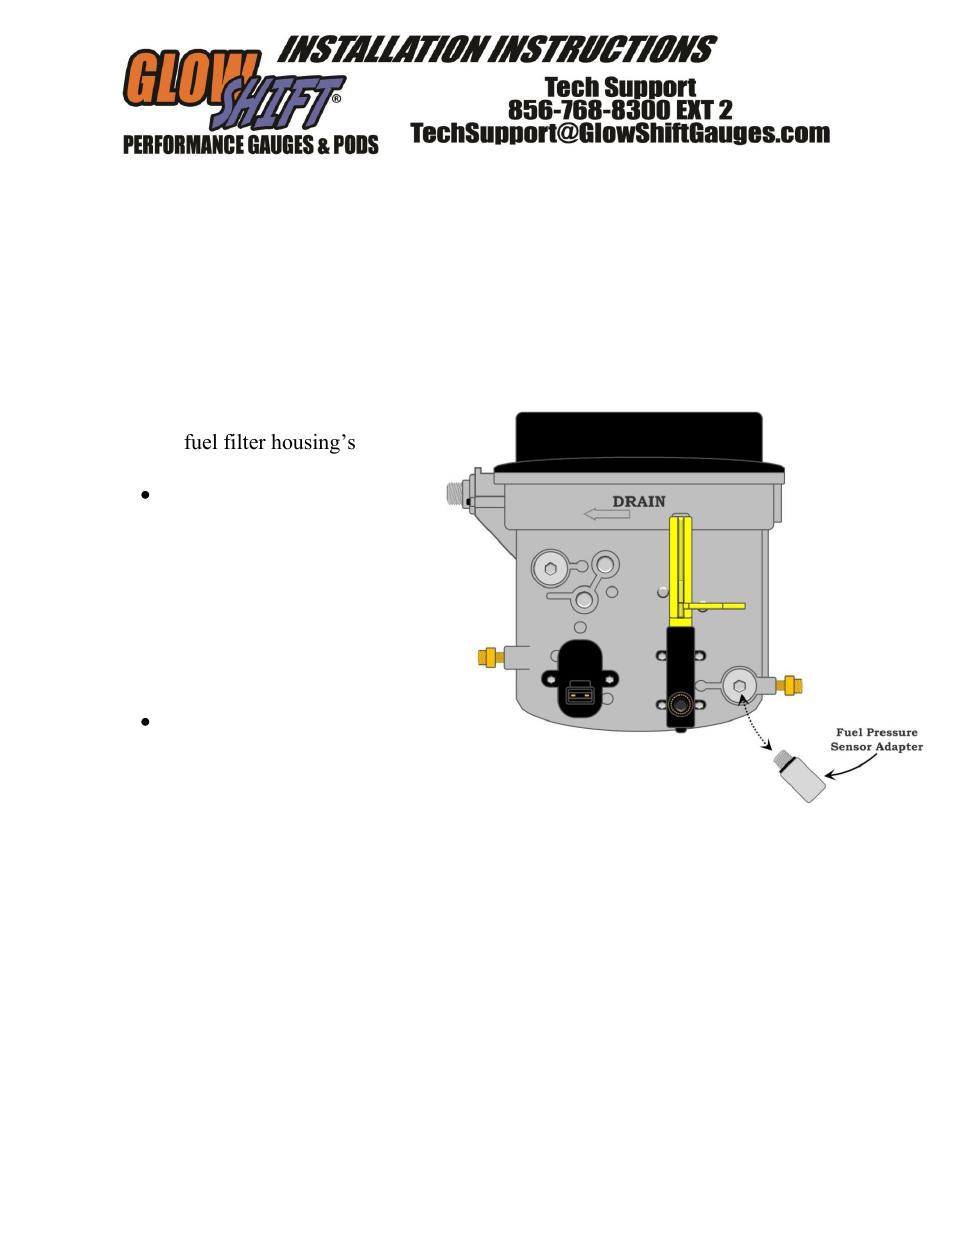 7 3 Fuel Filter Housing Diagram - Wiring Diagram Networks